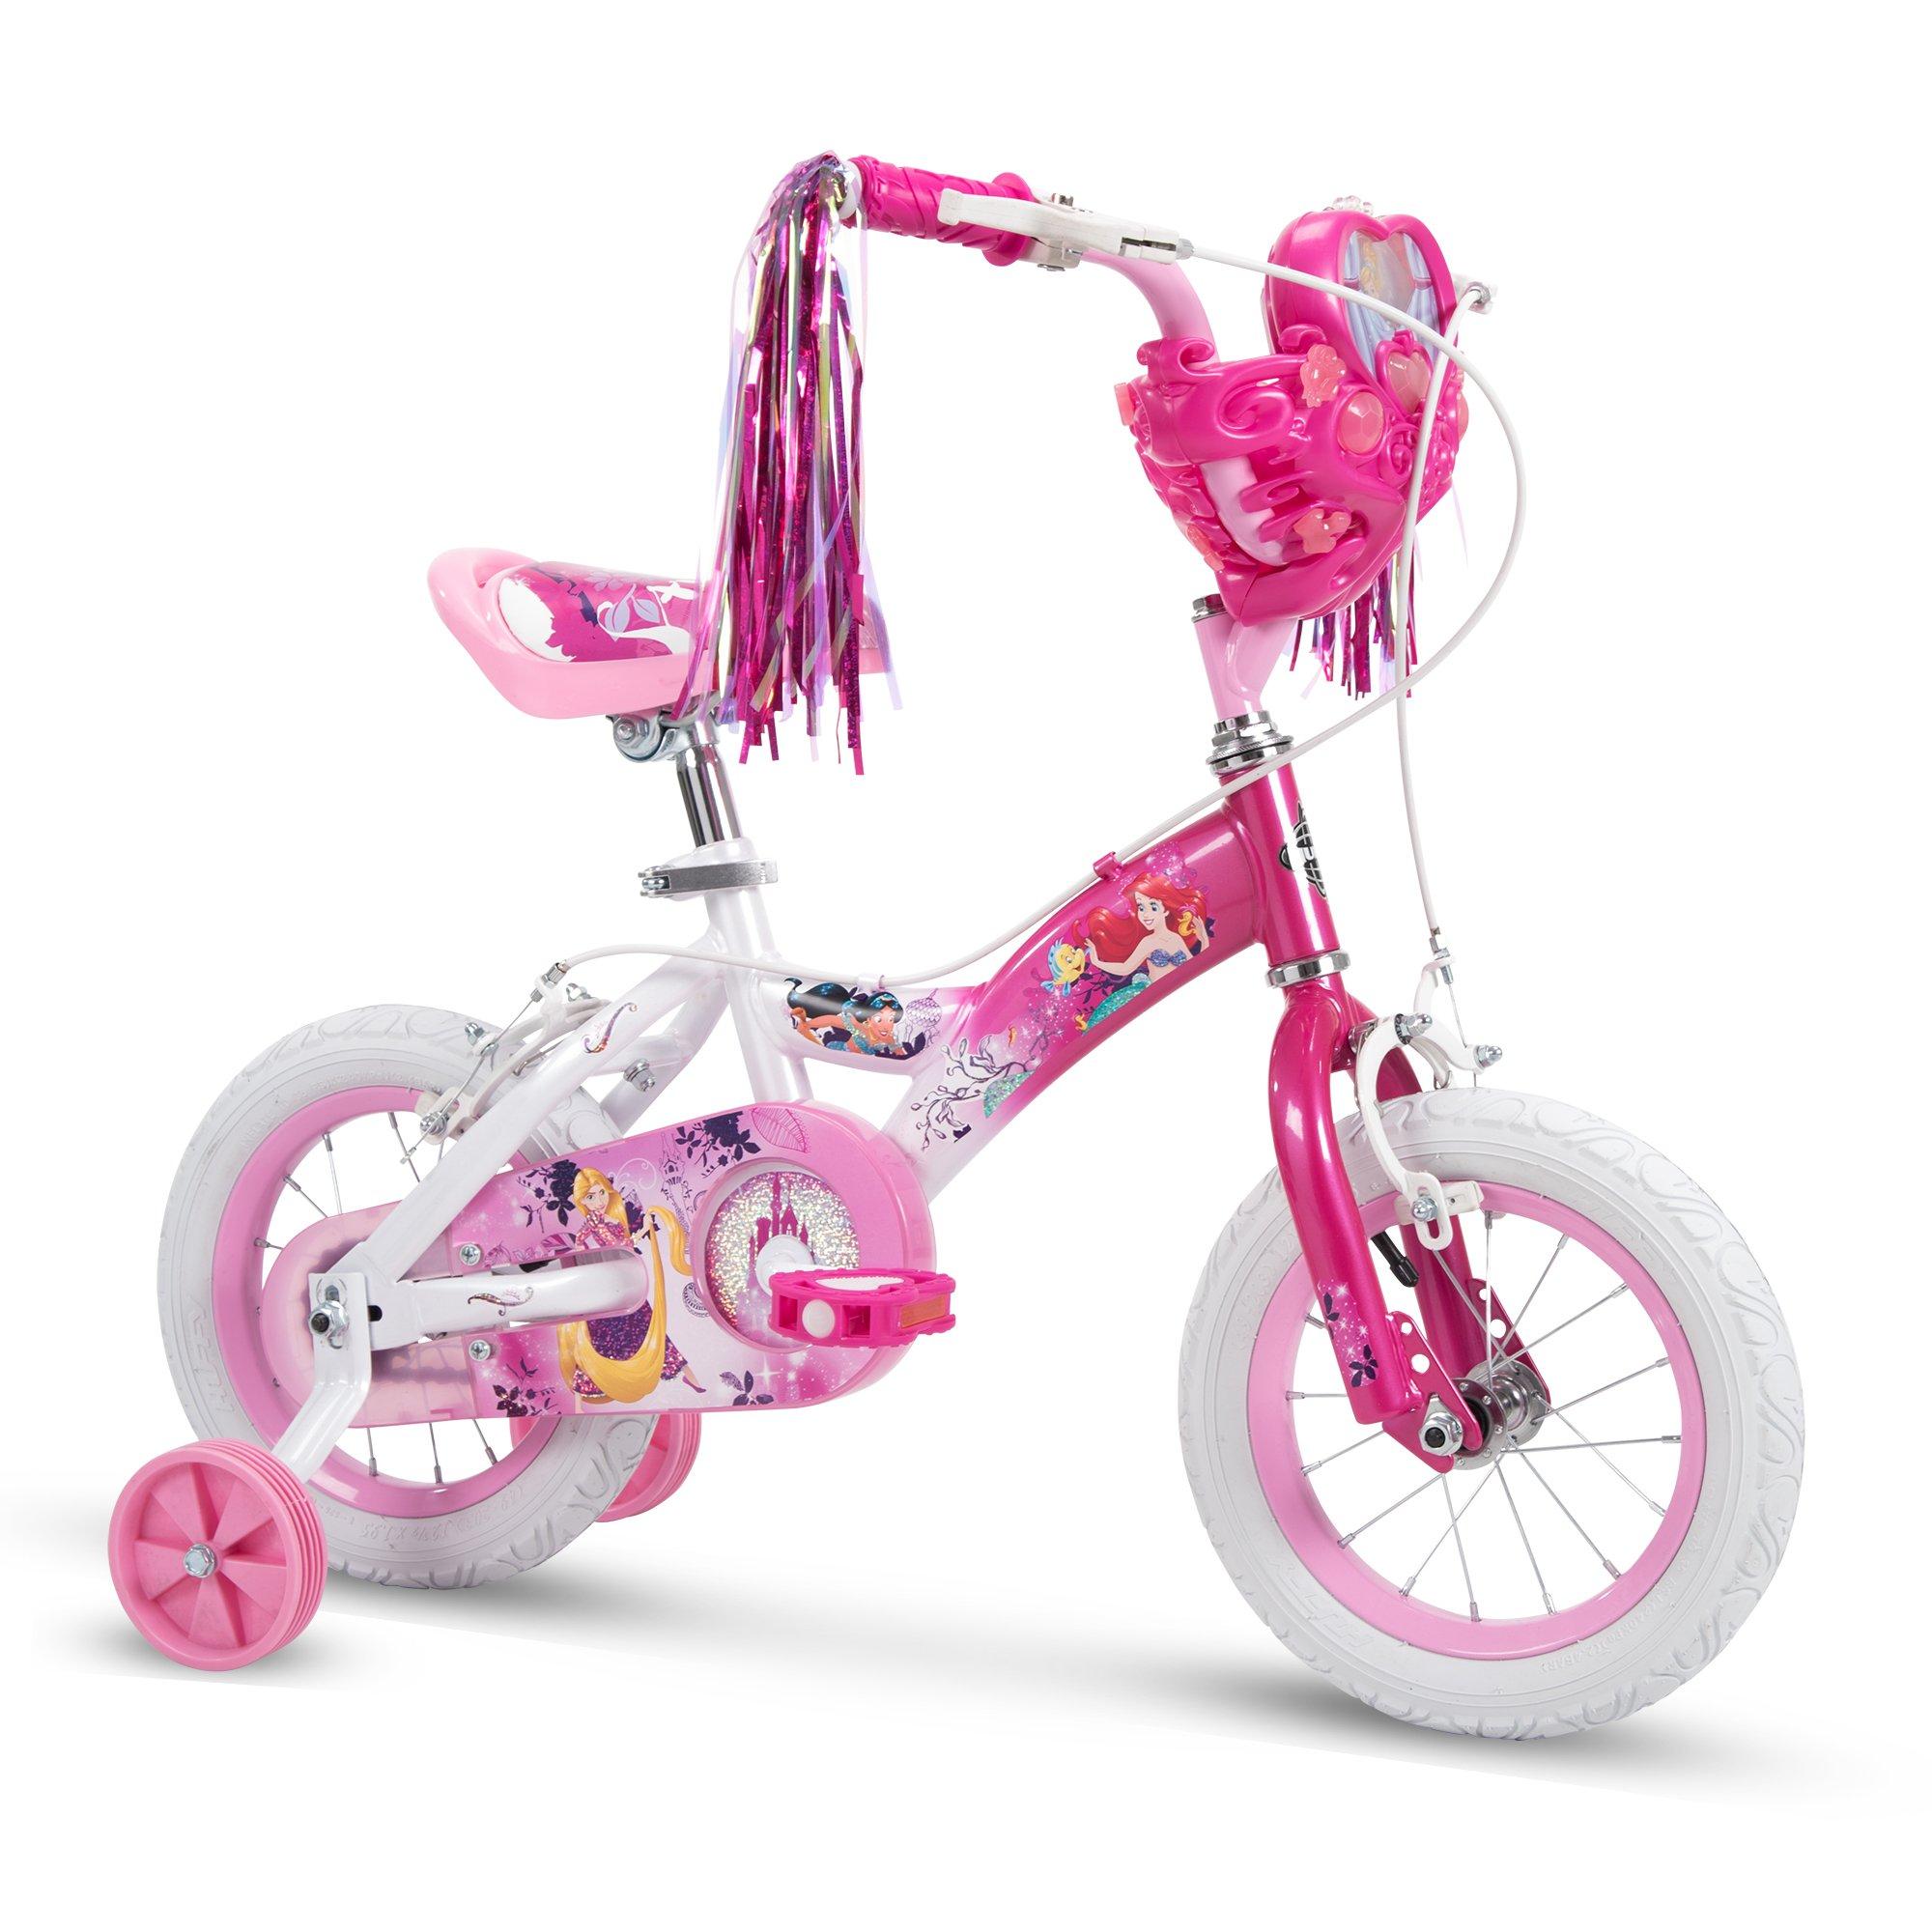 12'' Disney Princess Girls Bike by Huffy, Choose Your Own Princess Basket